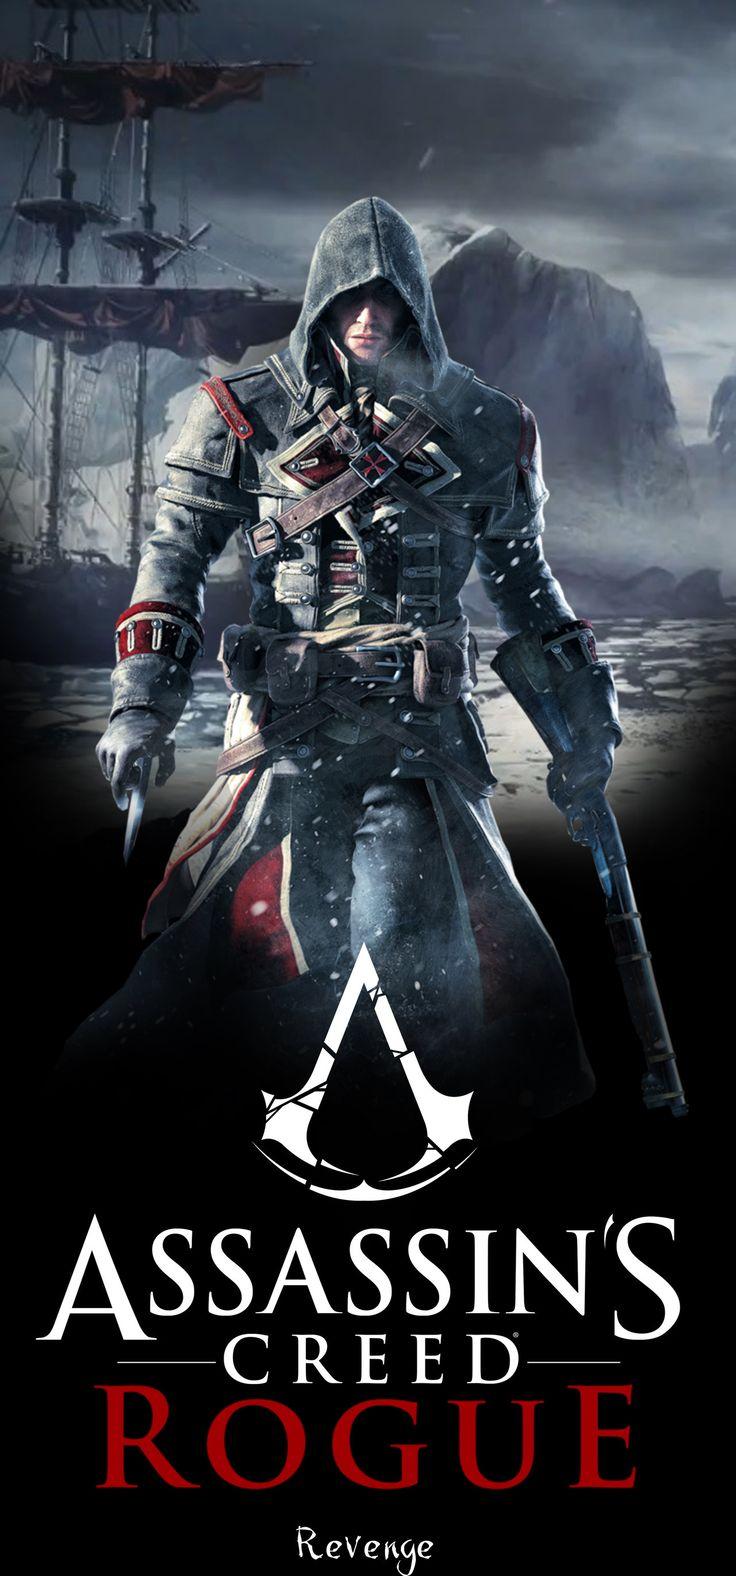 Assassin's Creed Poster (Large) - Shay by Ven93.deviantart.com on @deviantART